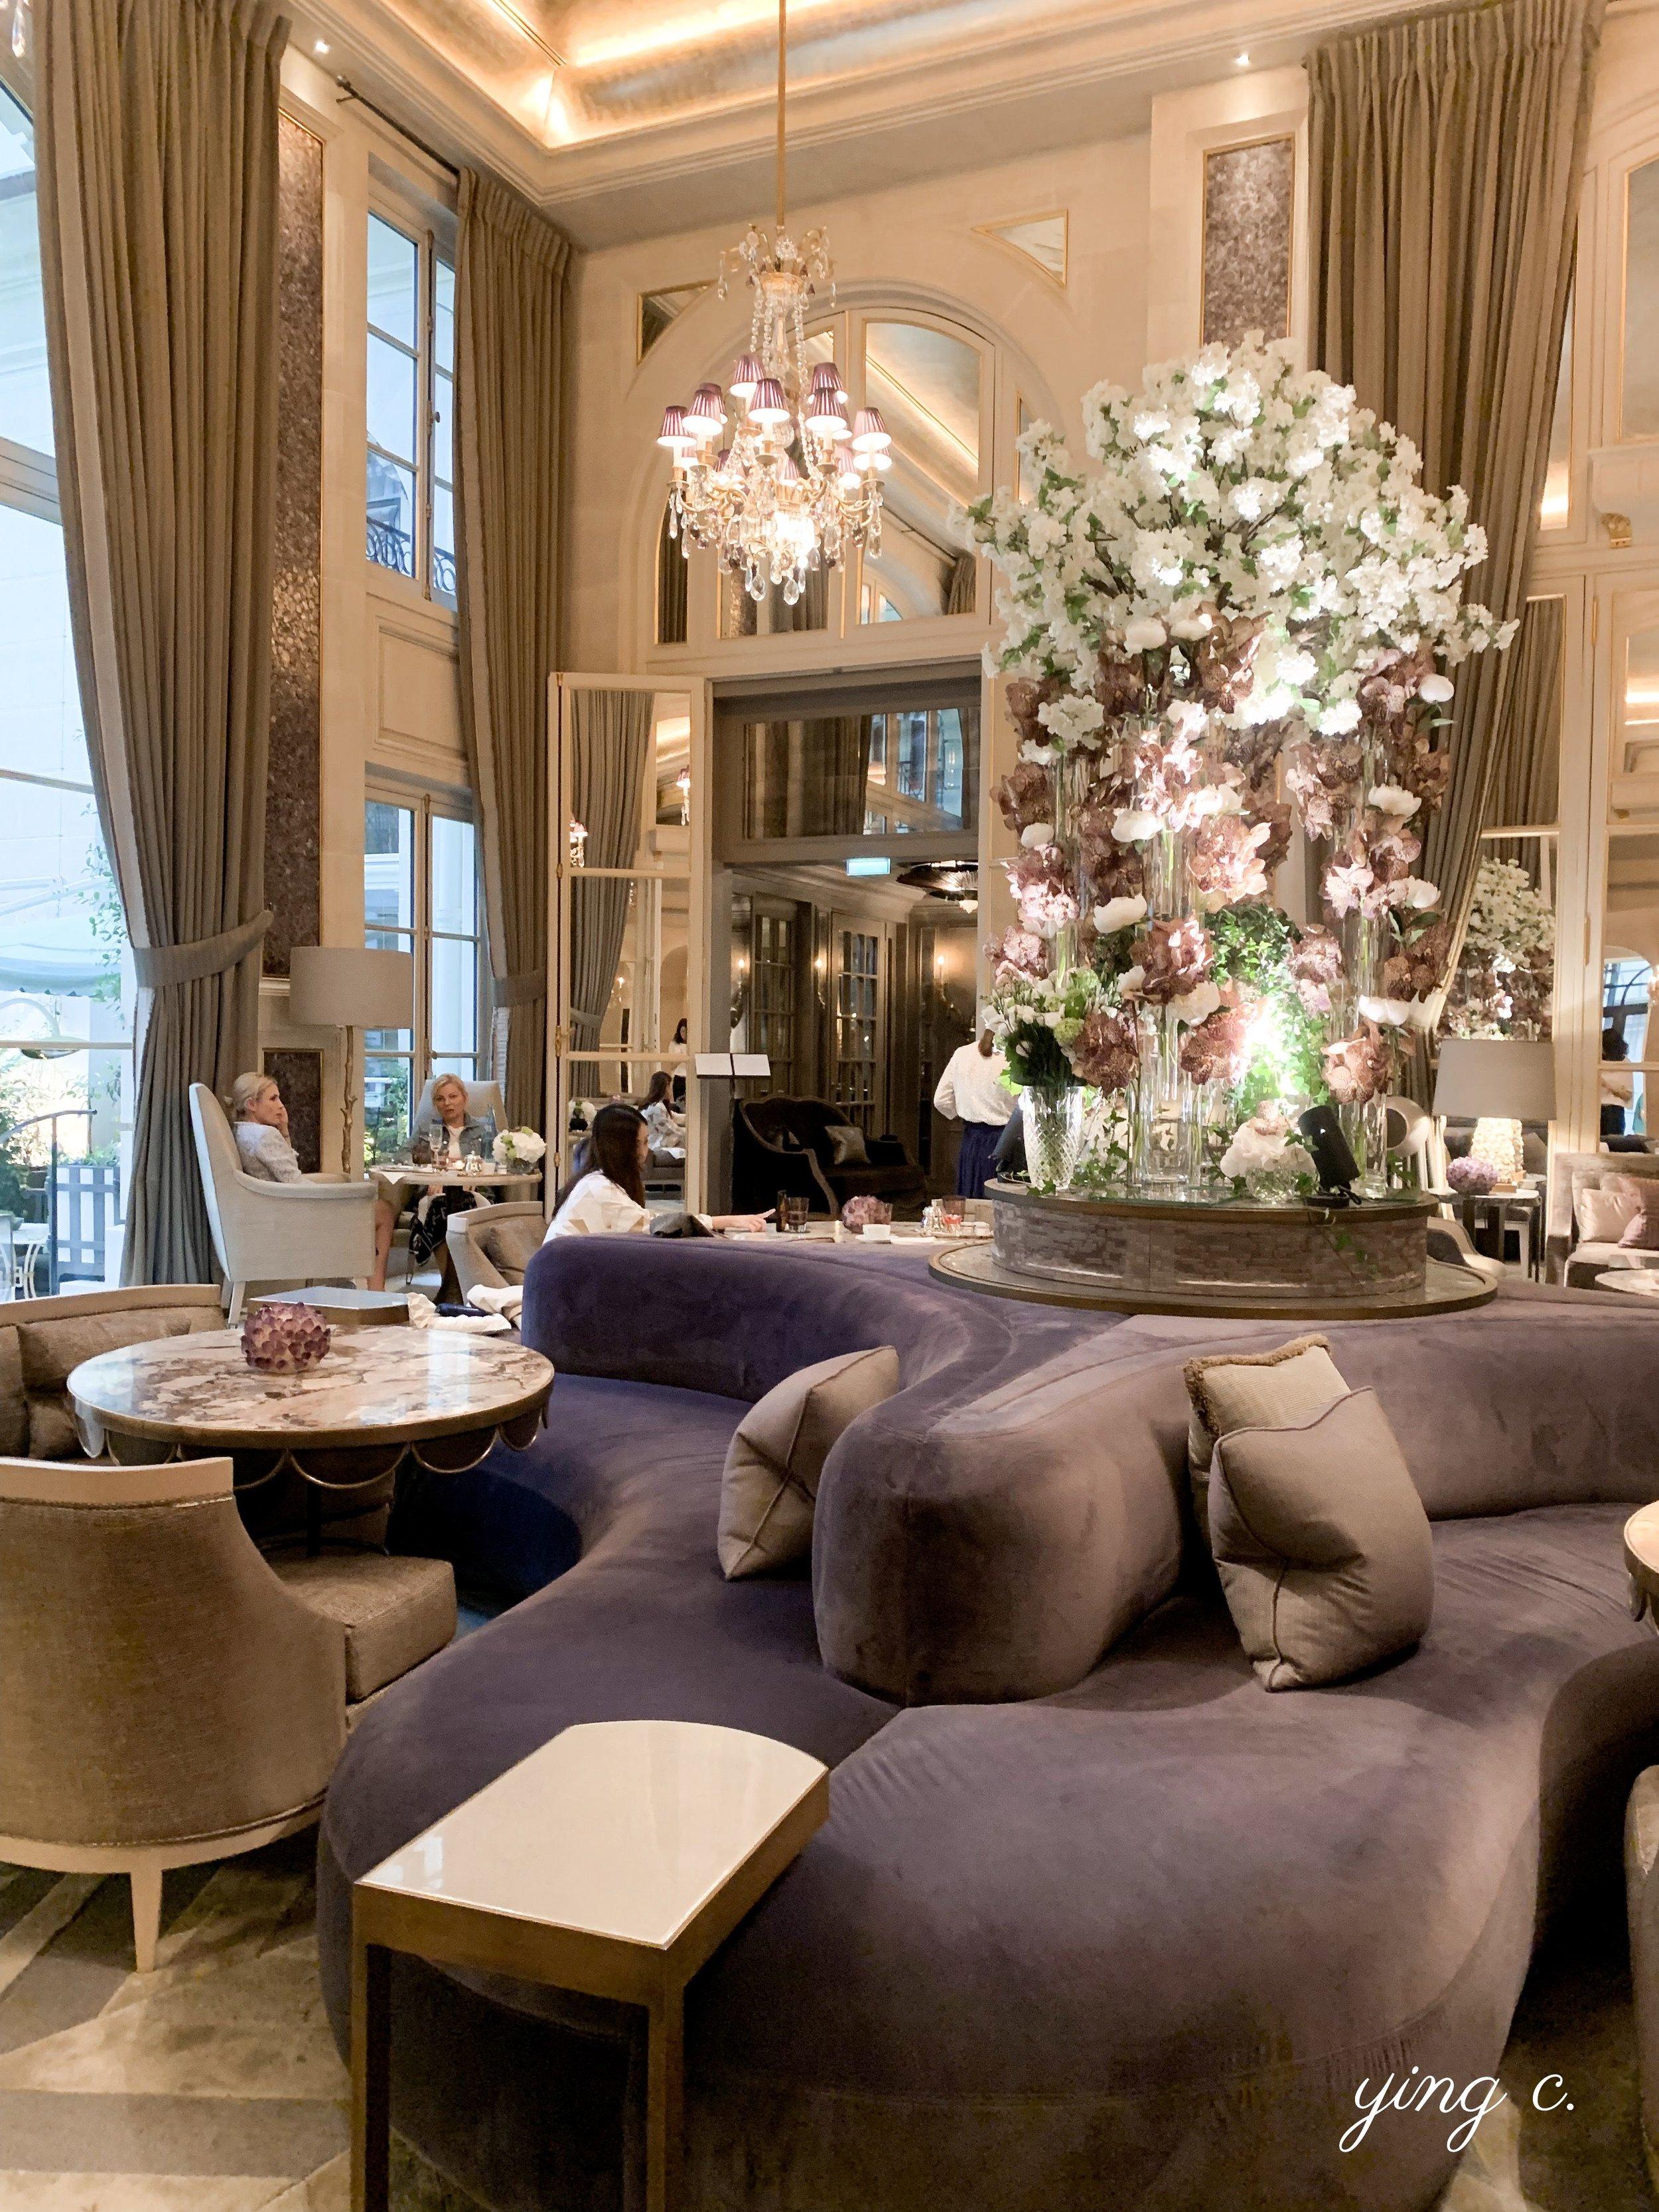 Hôtel de Crillon 內的「冬之花園」( Jardin d'Hiver )下午茶廳,以紫晶( améthyste )和赤鐵礦( hématite )的顏色為裝潢主色系。